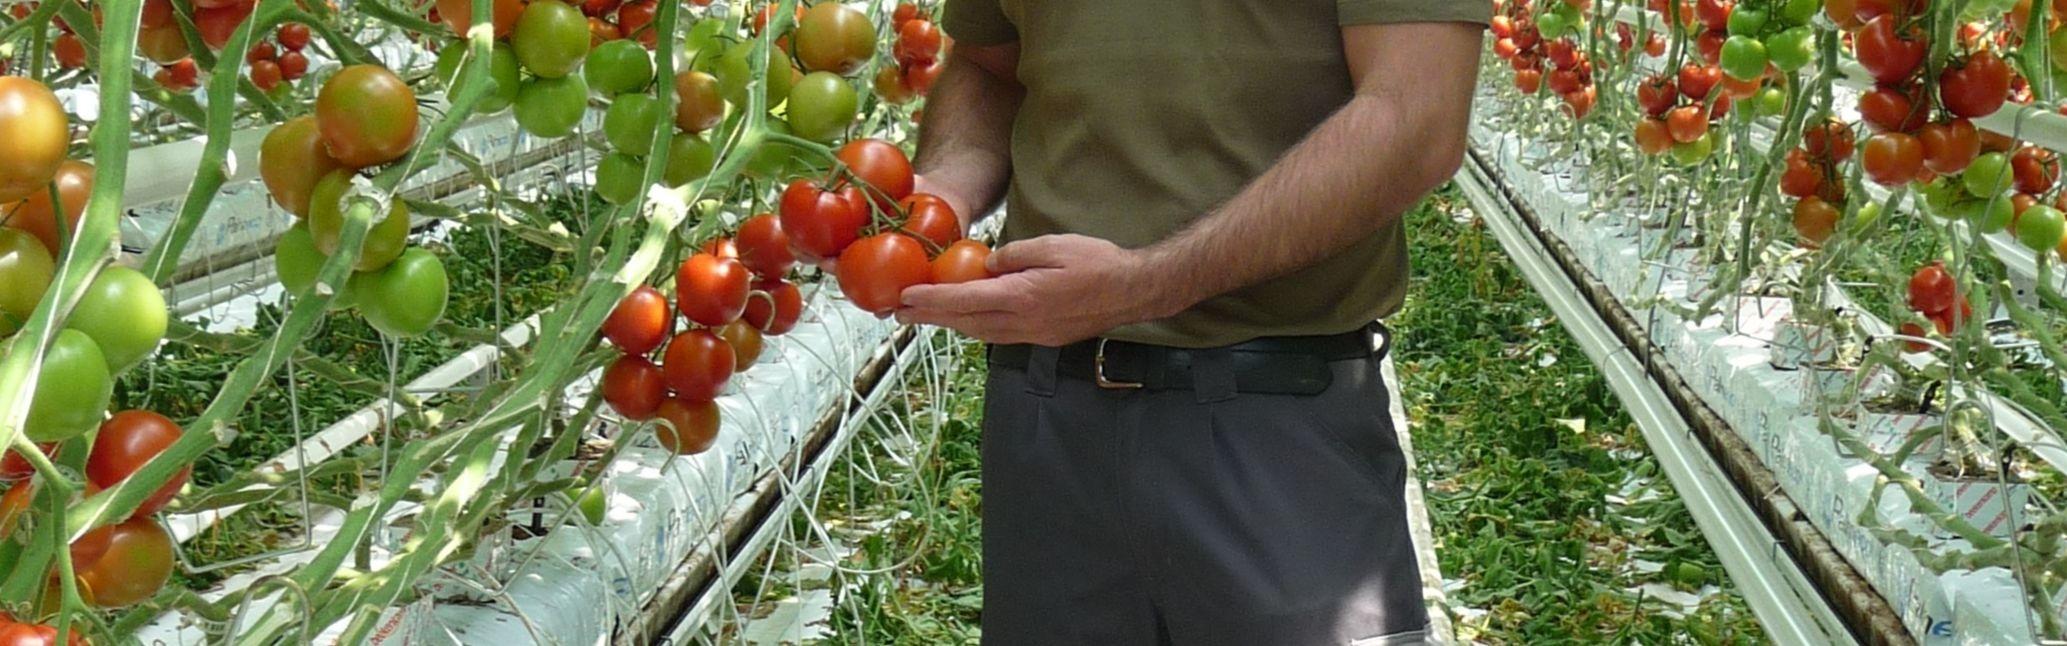 Tomaten gewächshaus hors-sol gemüsebauer